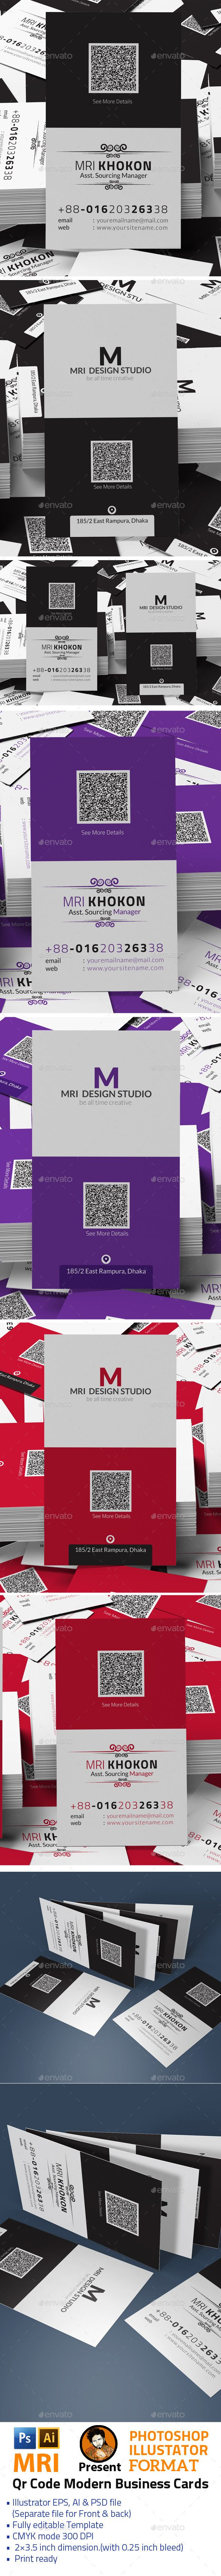 35 best business cards qr code images on pinterest